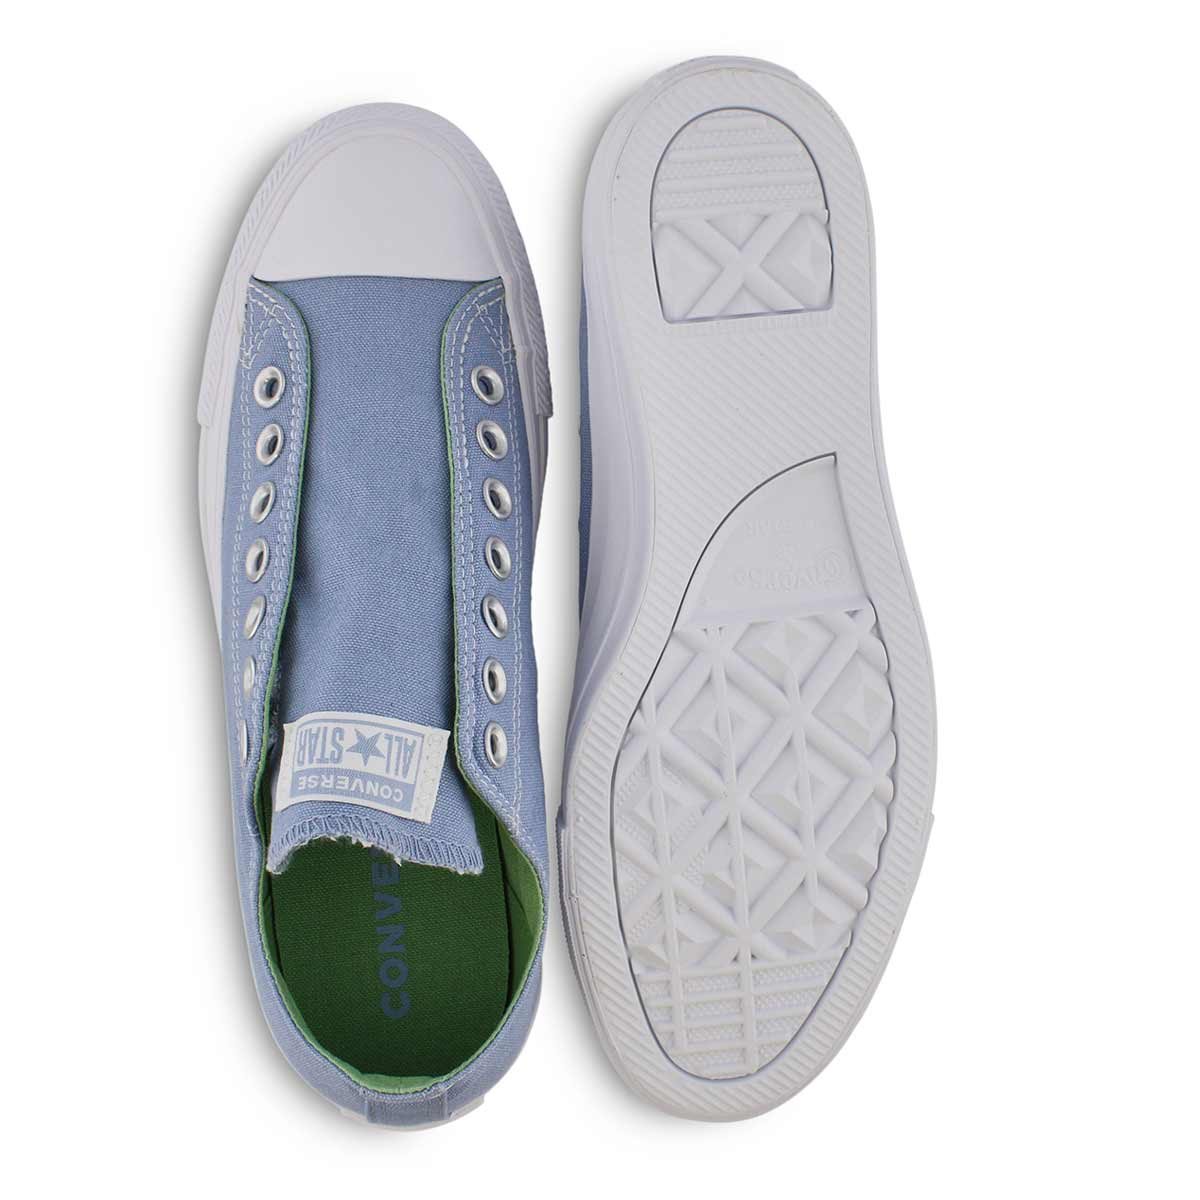 Converse-Women-039-s-Chuck-Taylor-All-Star-Slip-Fashion-Sneaker miniature 16